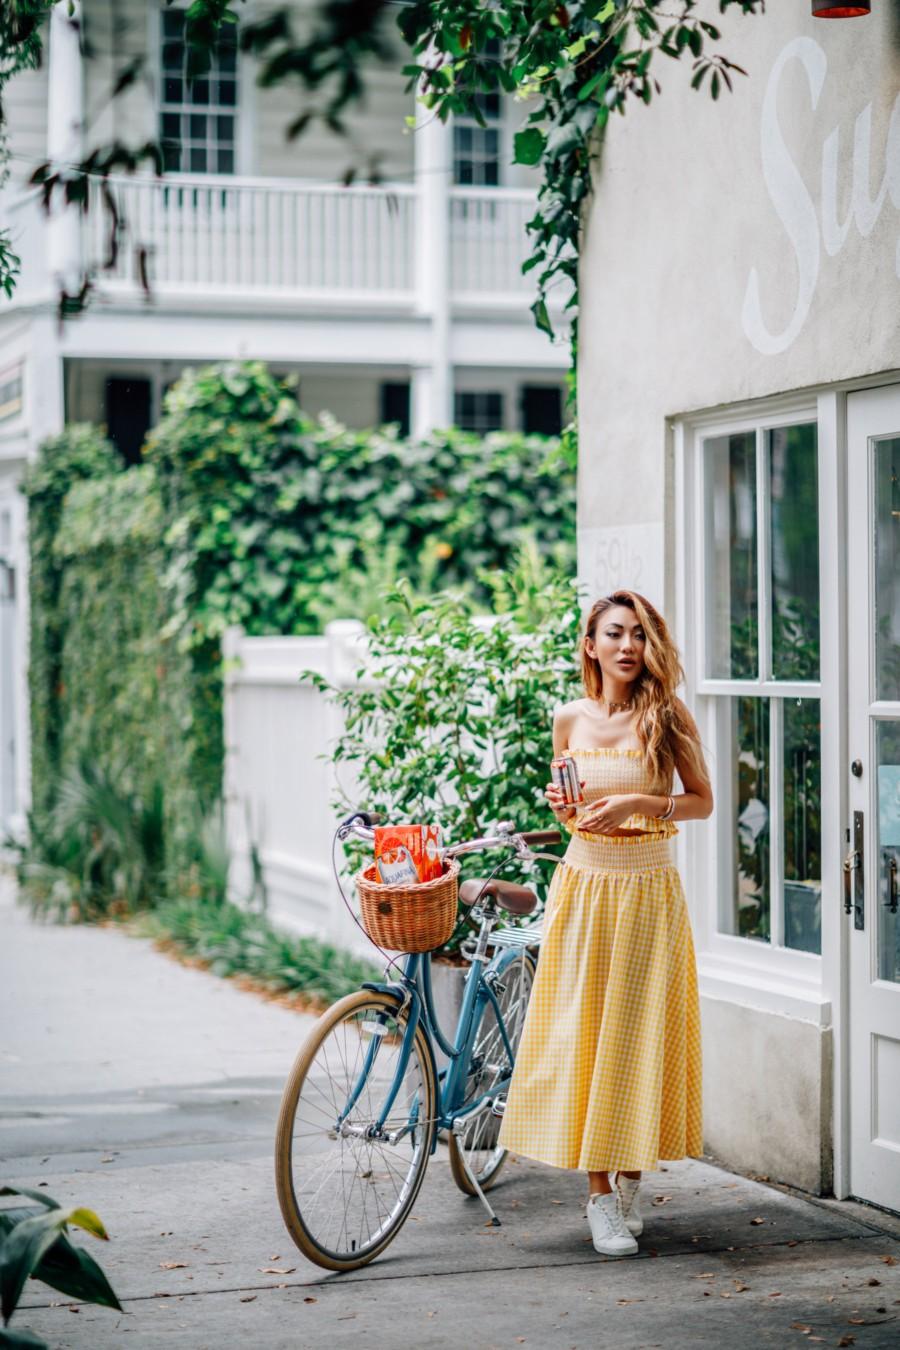 Summer style: самые обсуждаемые образы августа